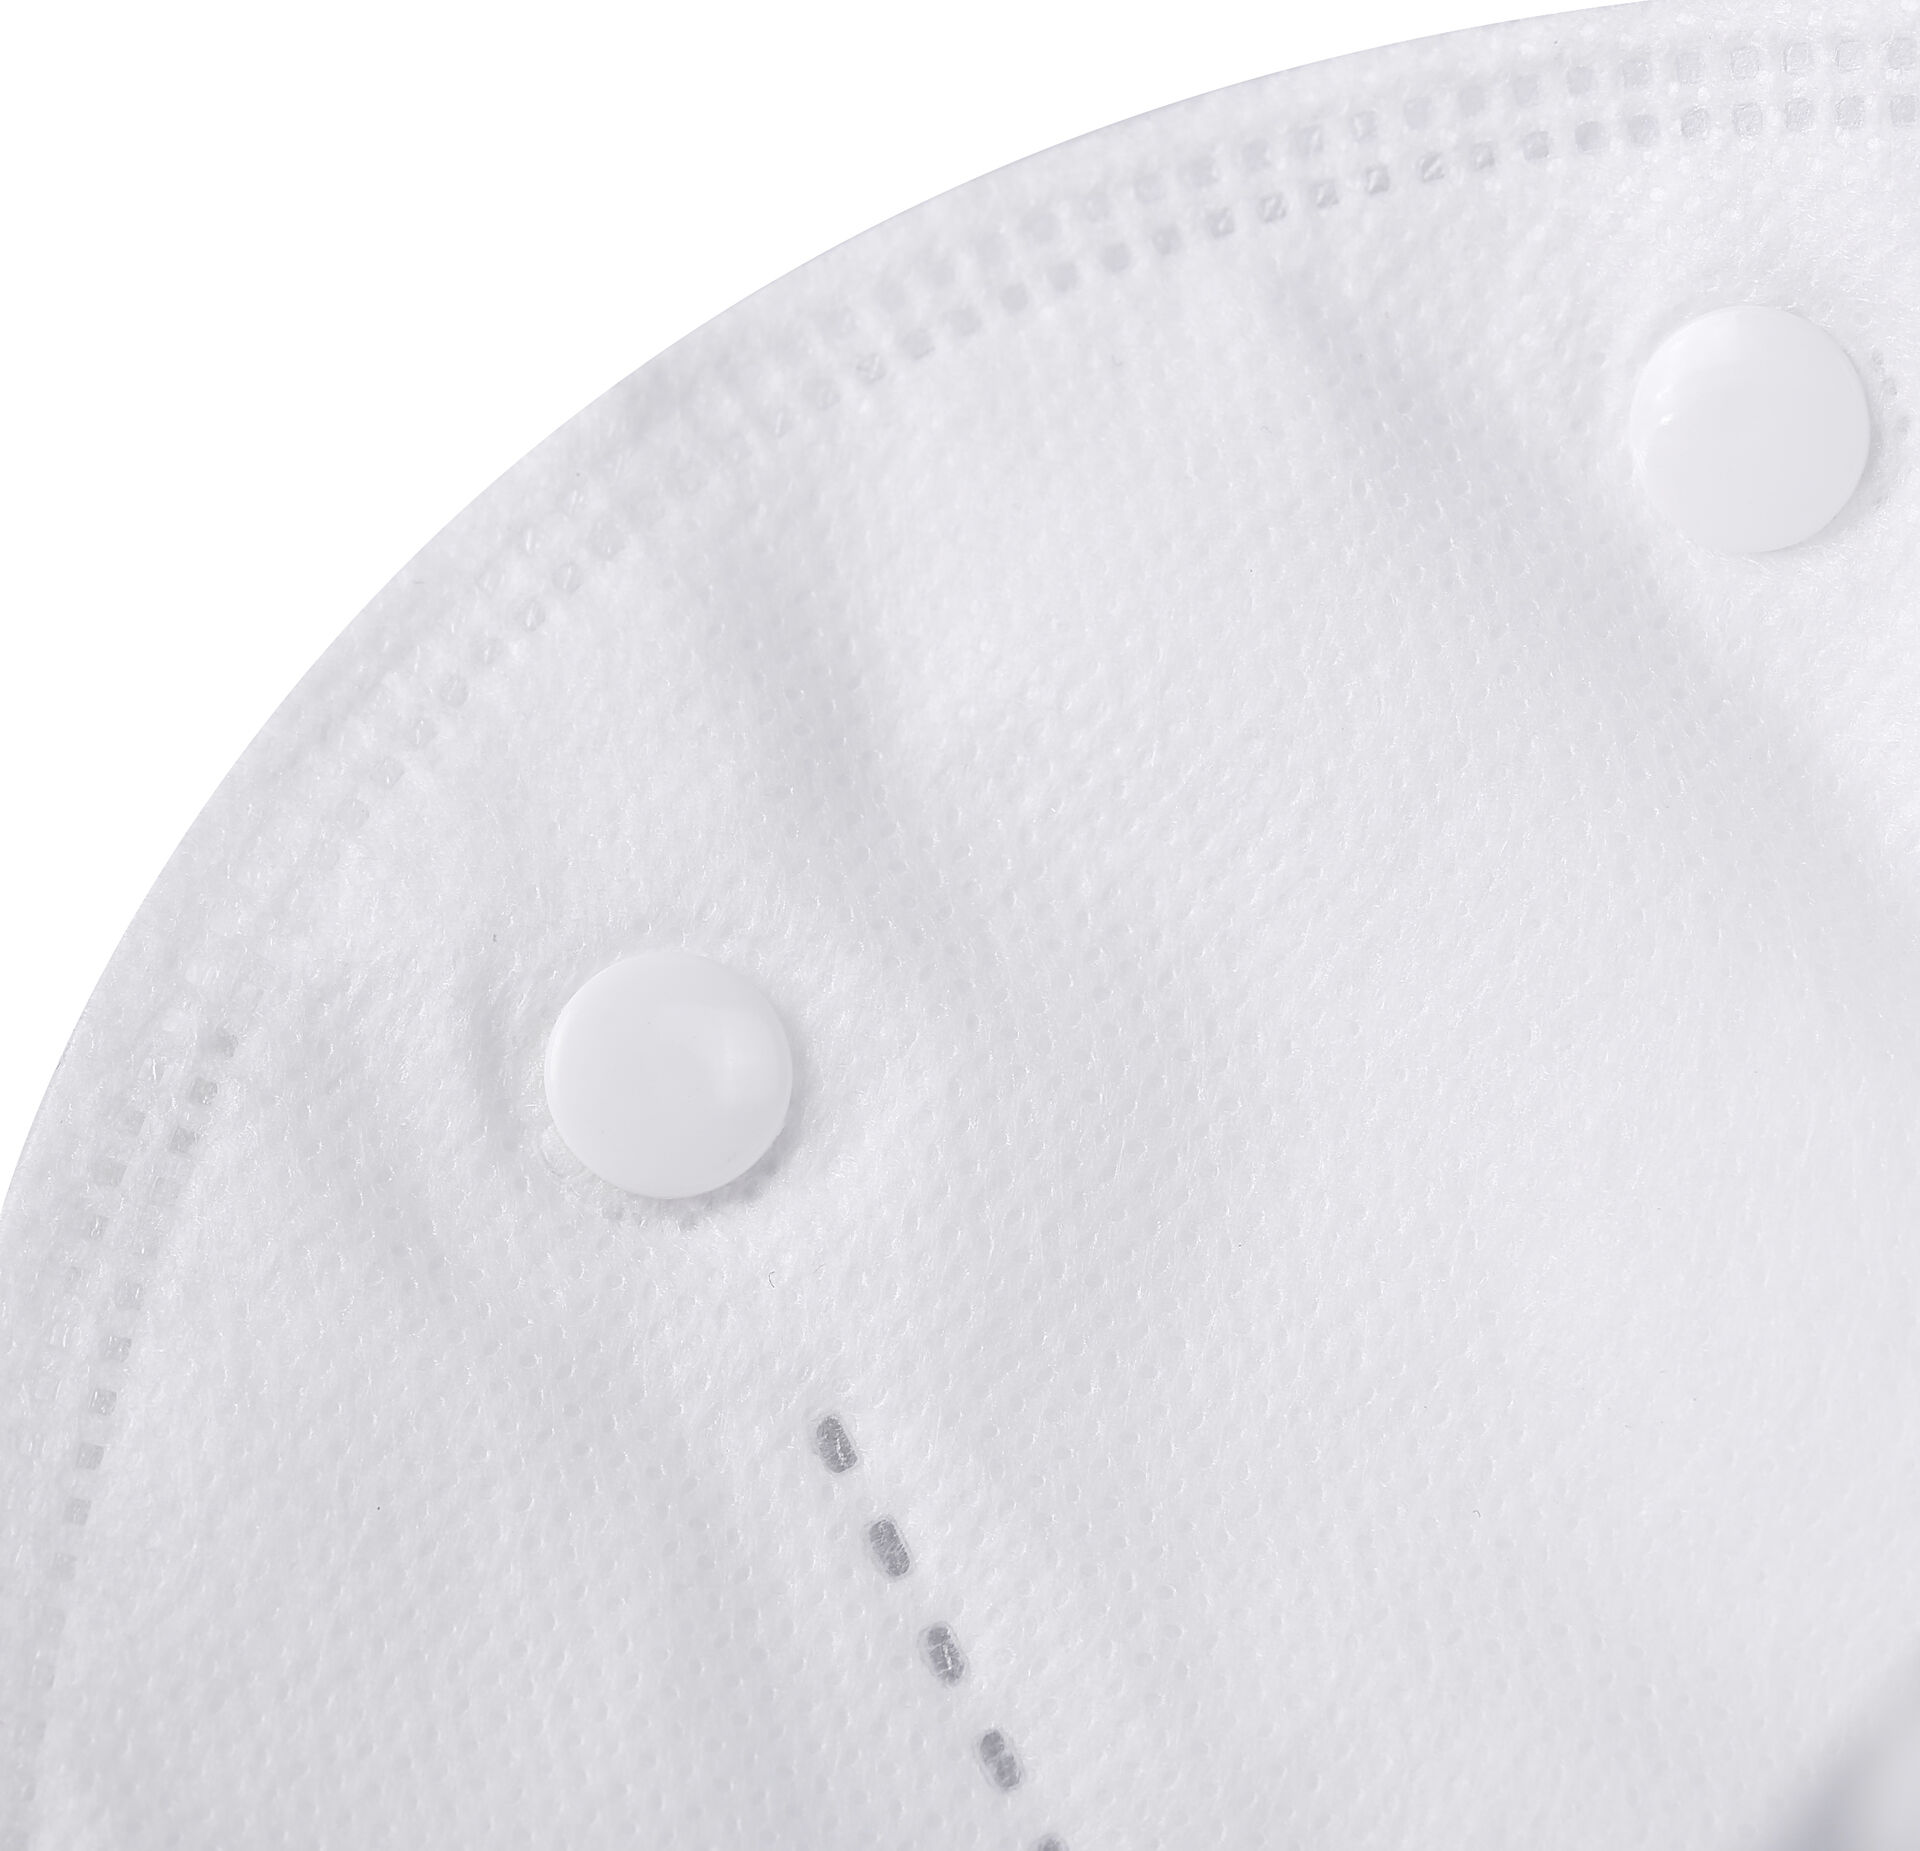 N95 Flat Fold Respirator Masks with Ear Loops